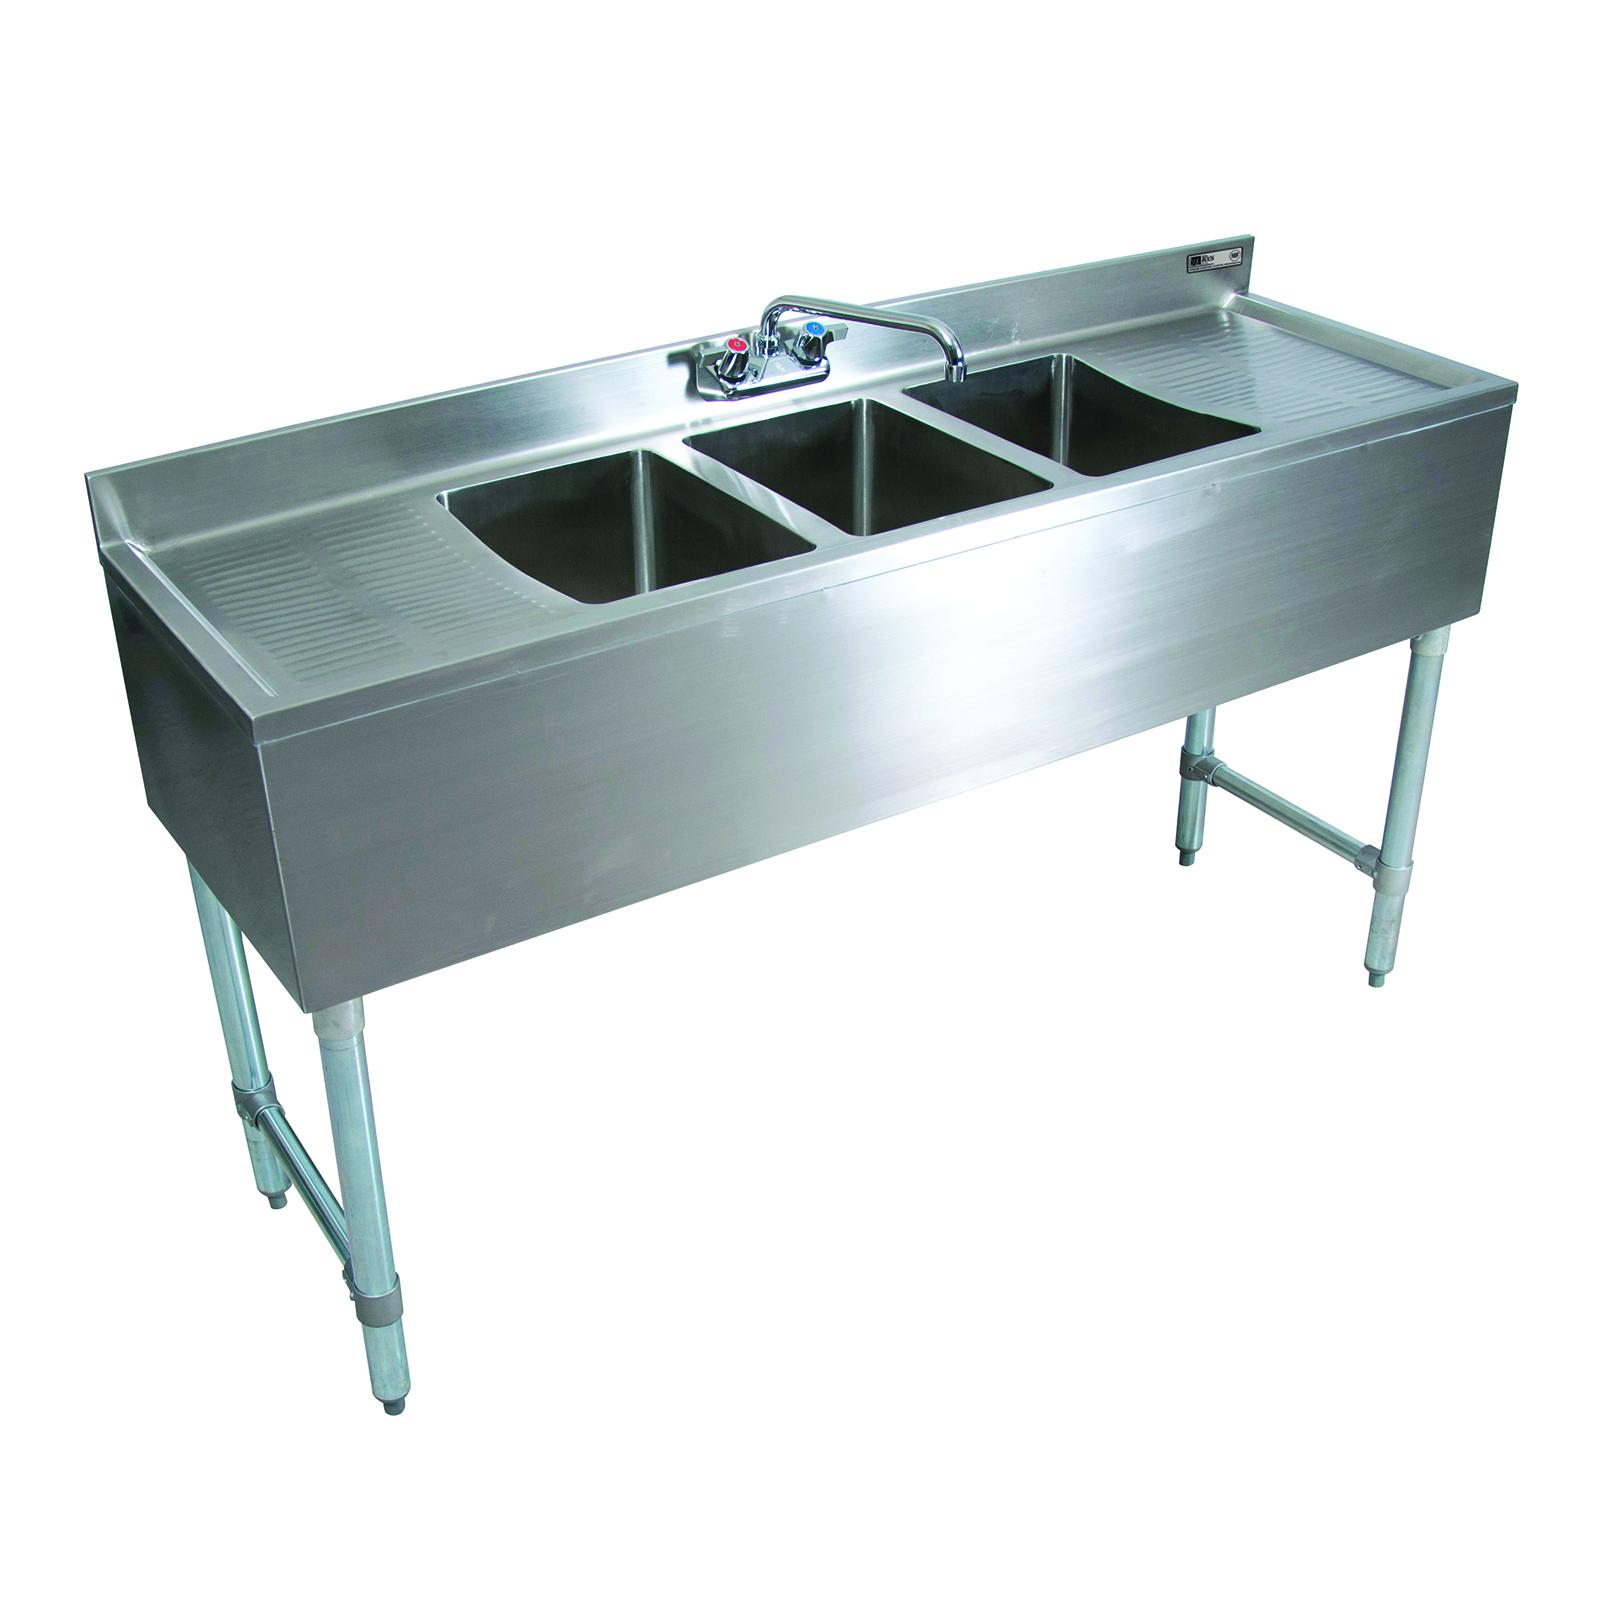 John Boos EUB2S36-1RD underbar sink units